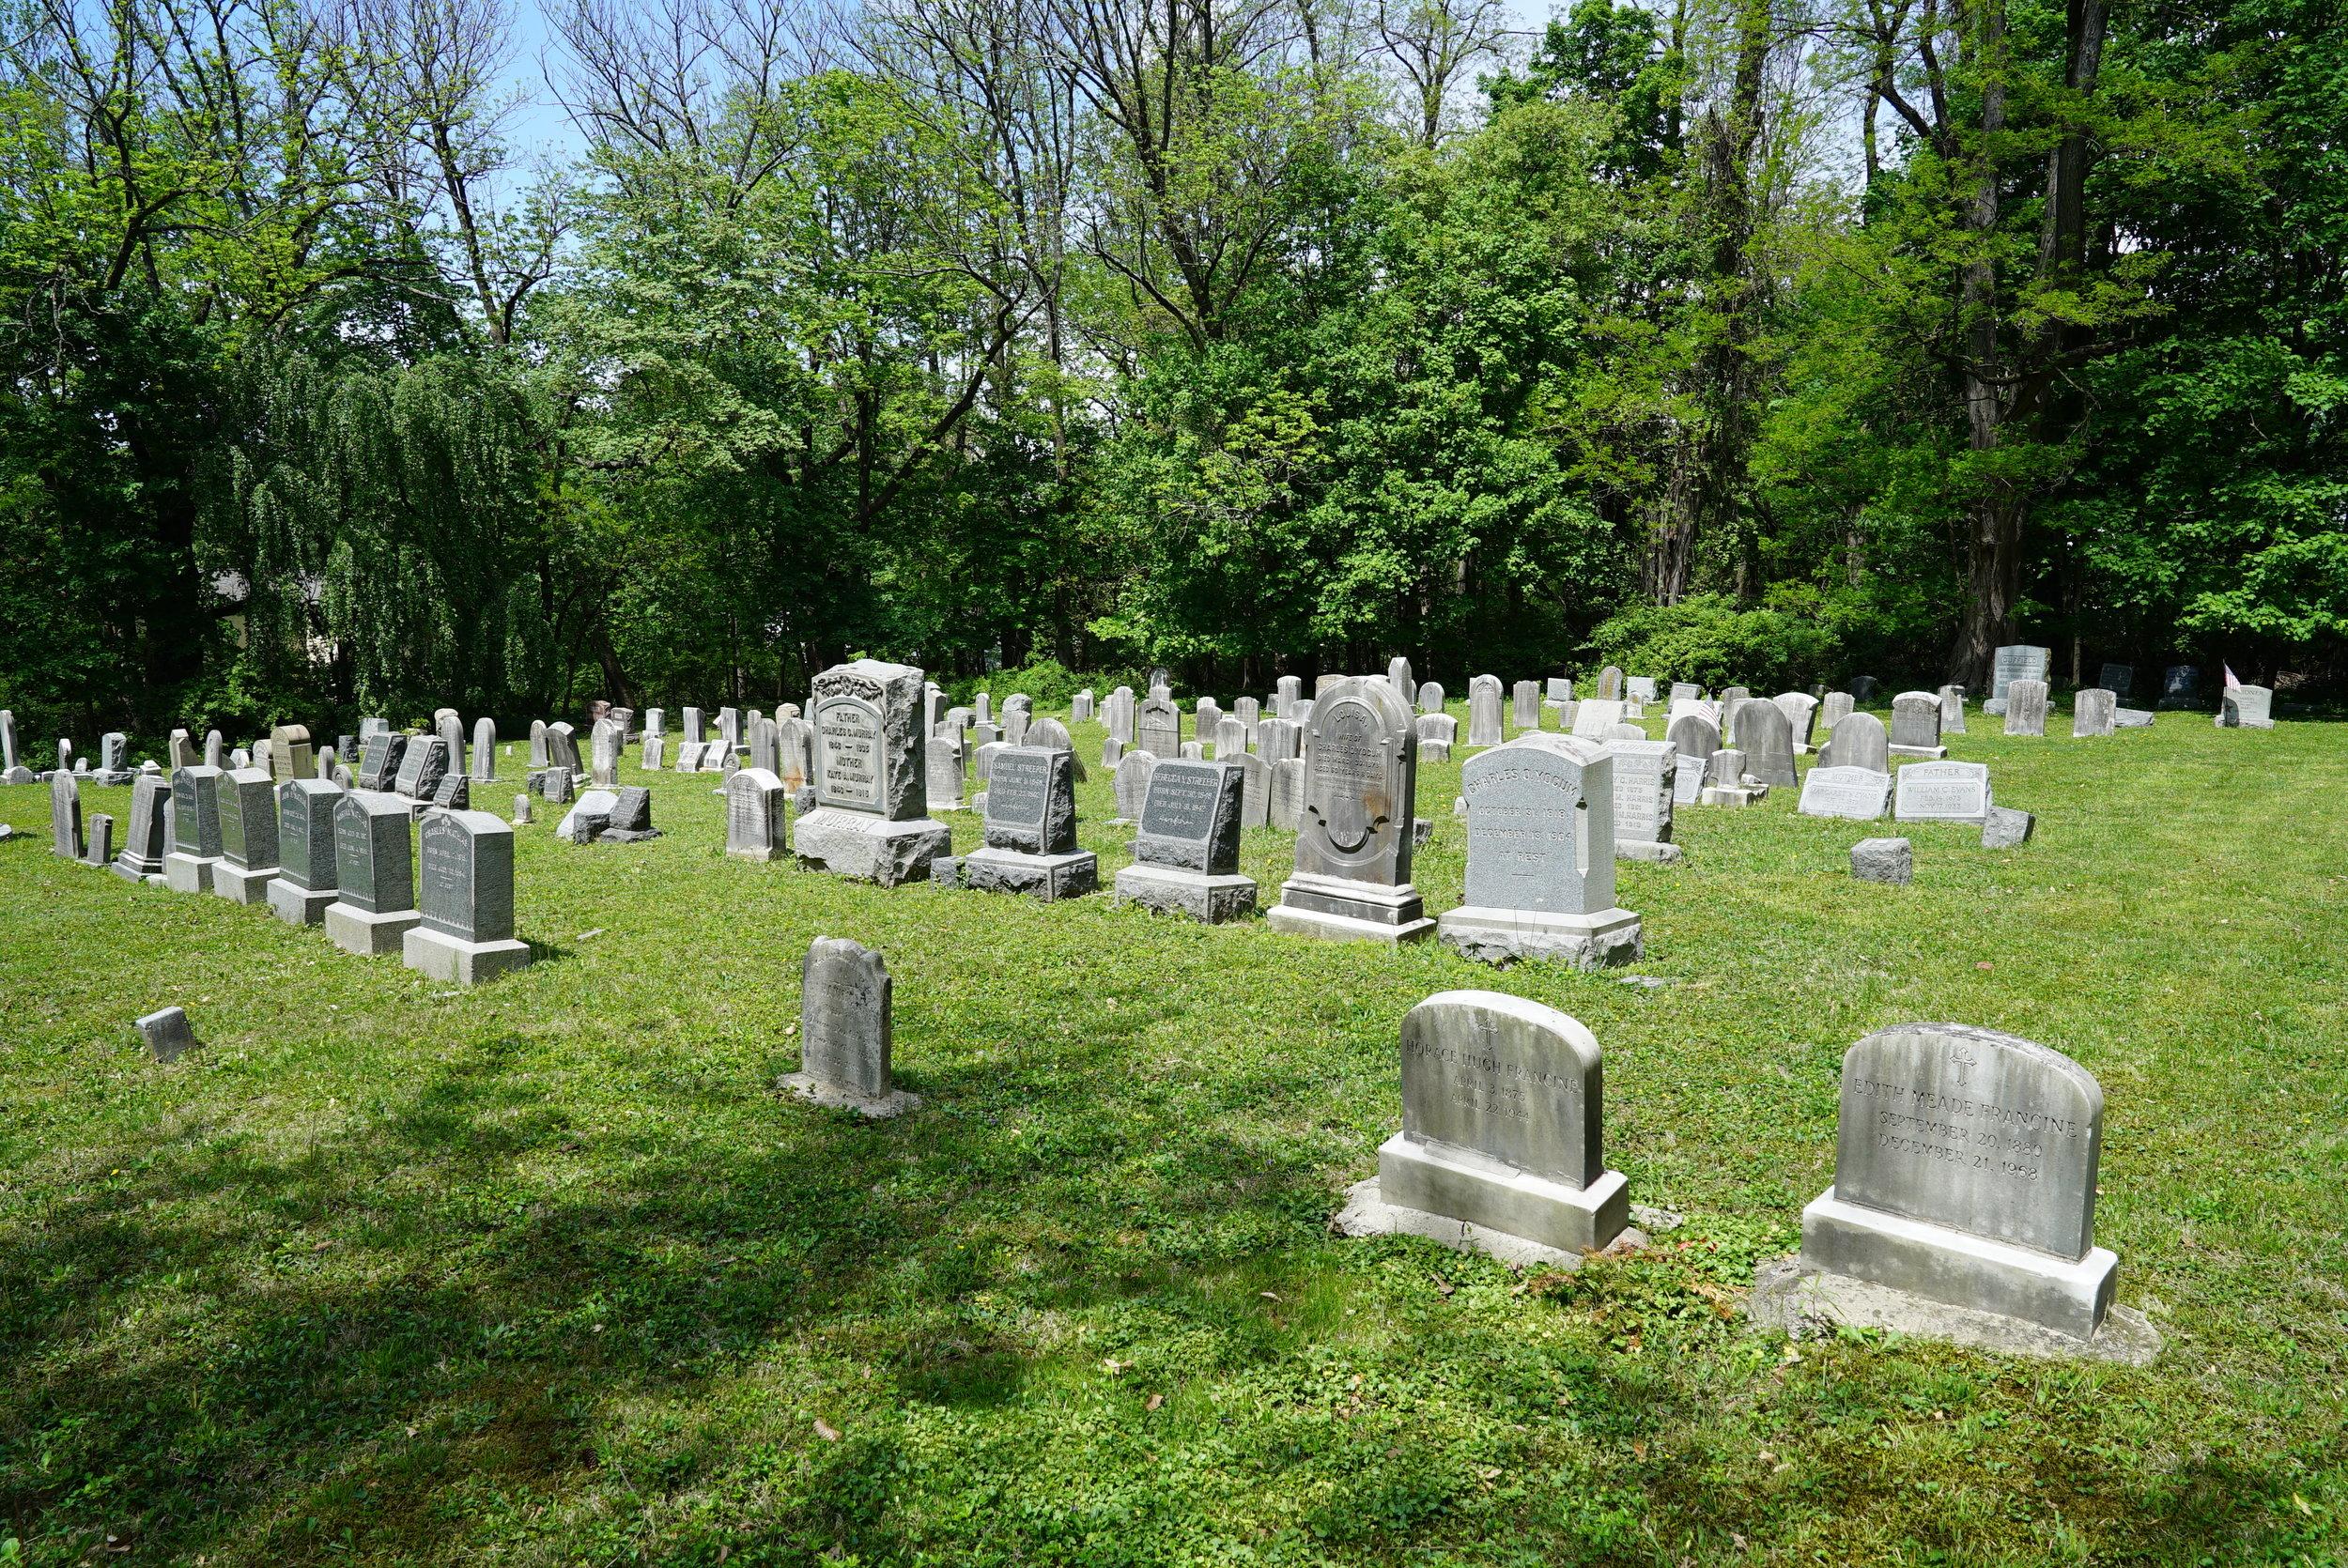 Mount Pleasant Baptist Church Cemetery. Ambler, Pennsylvania.